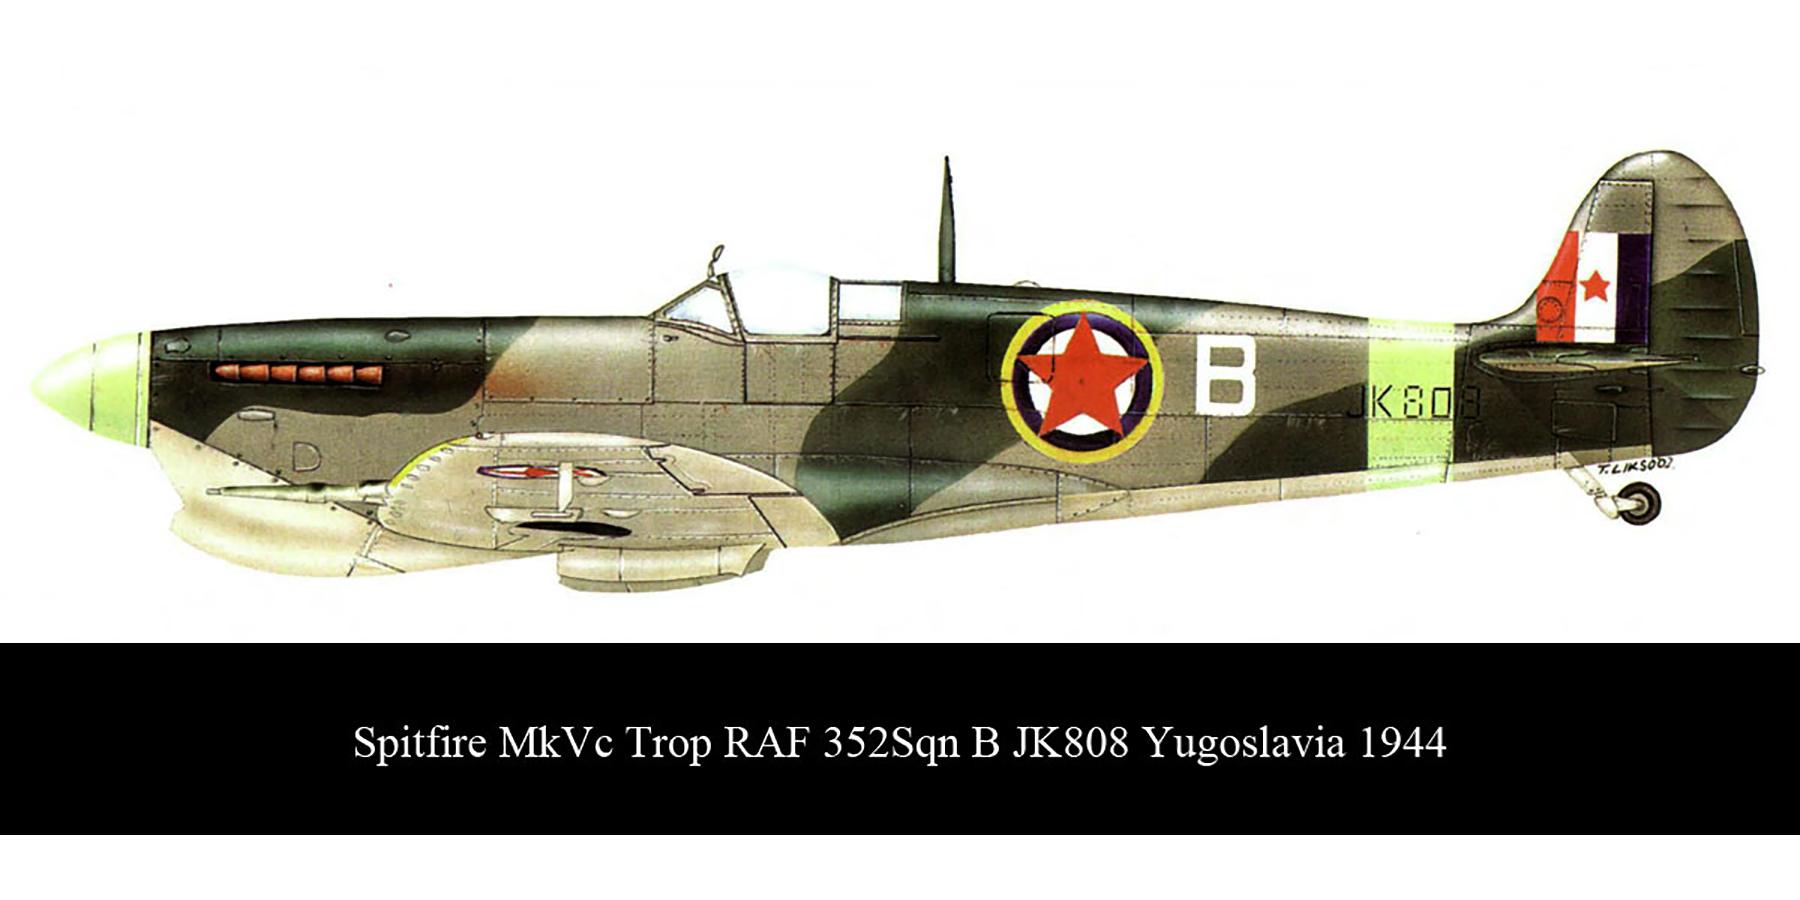 Spitfire MkVcTrop RAF 352Sqn B JK808 Yugoslavia 1944 00